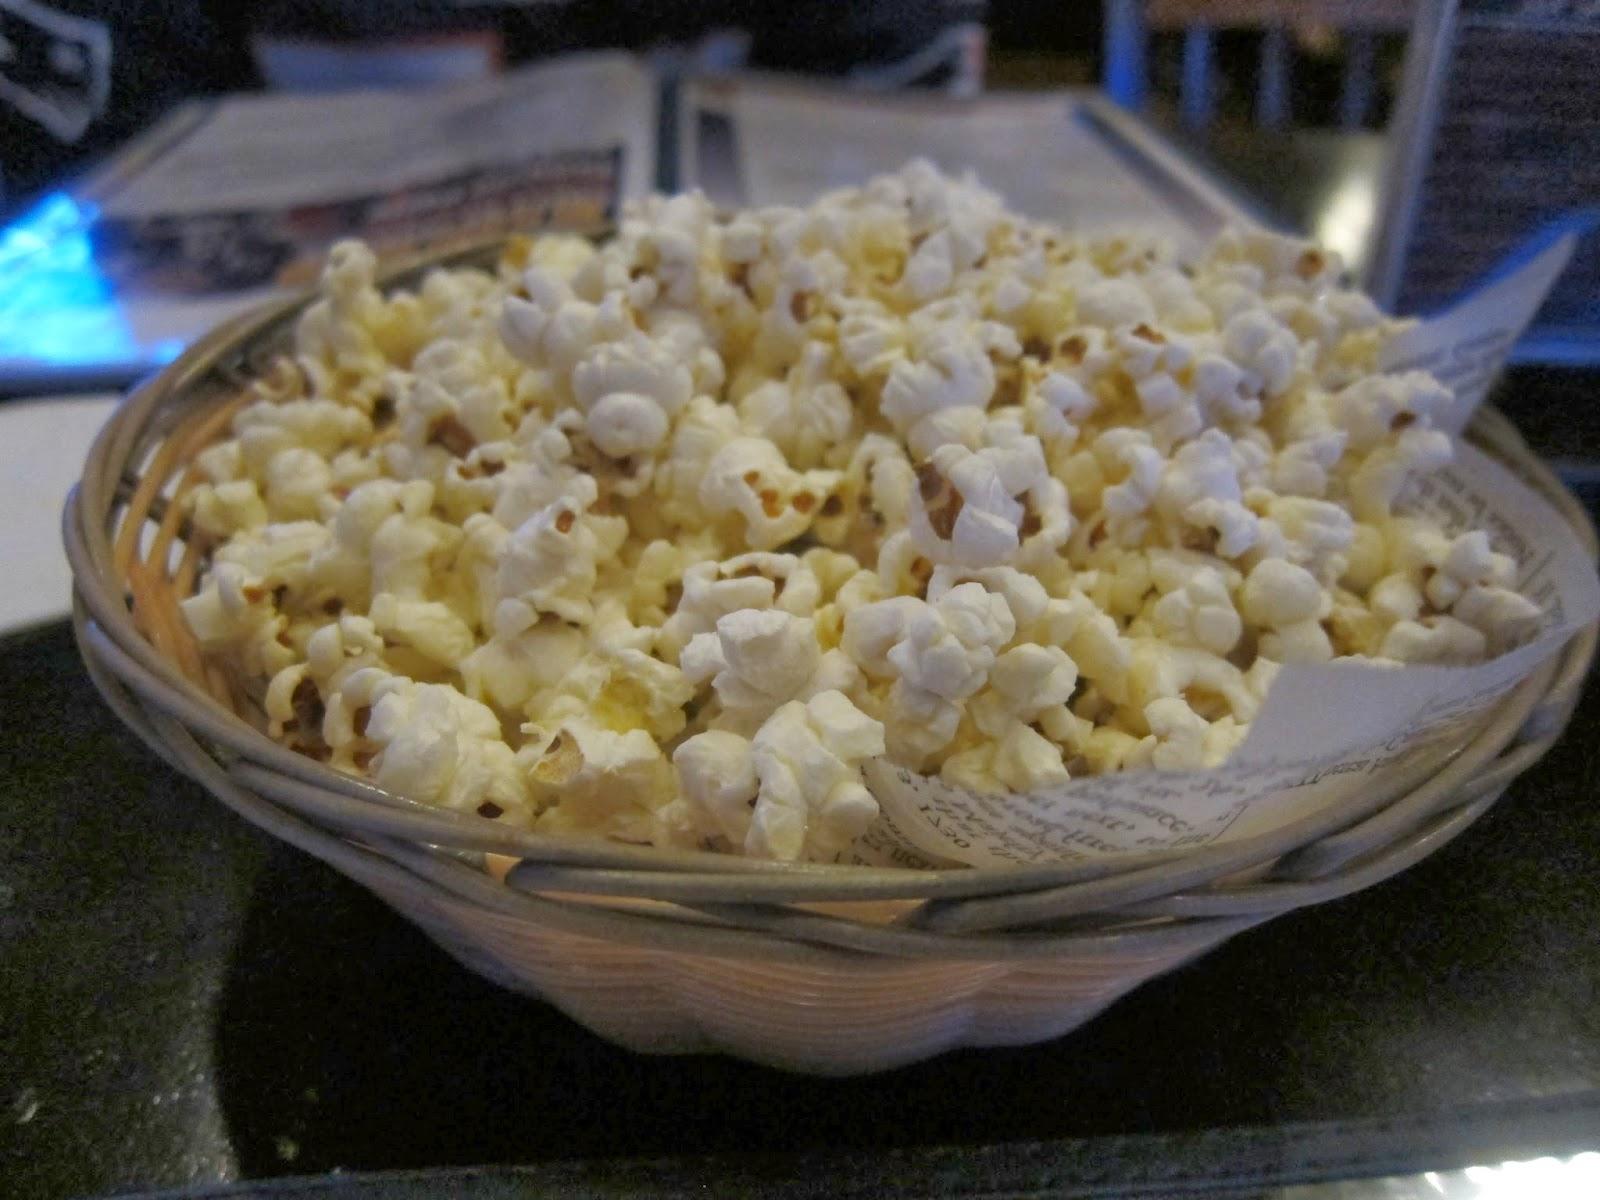 Scoreboard free popcorn Woburn